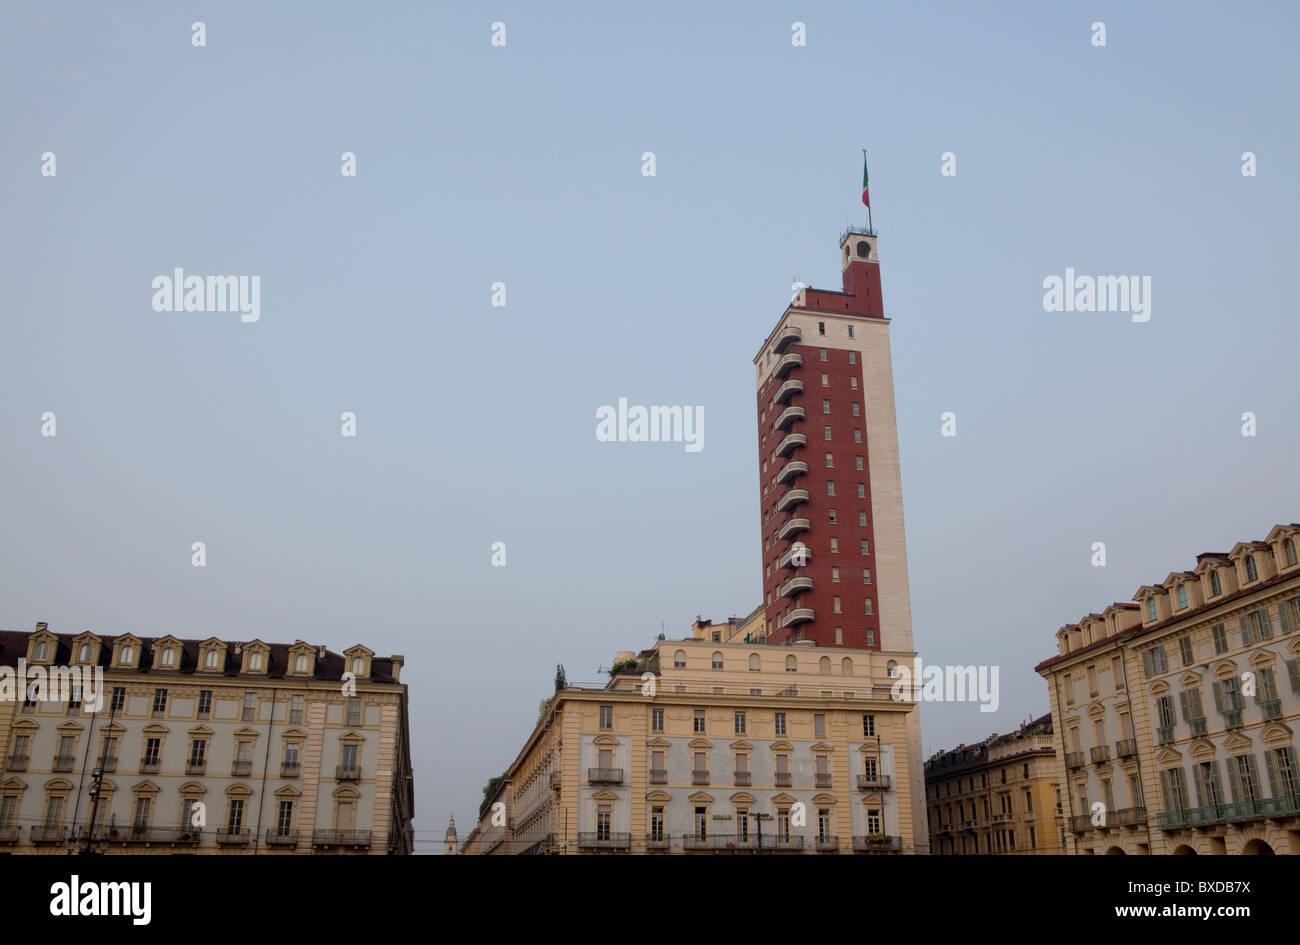 Torino Sky Scraper - Stock Image